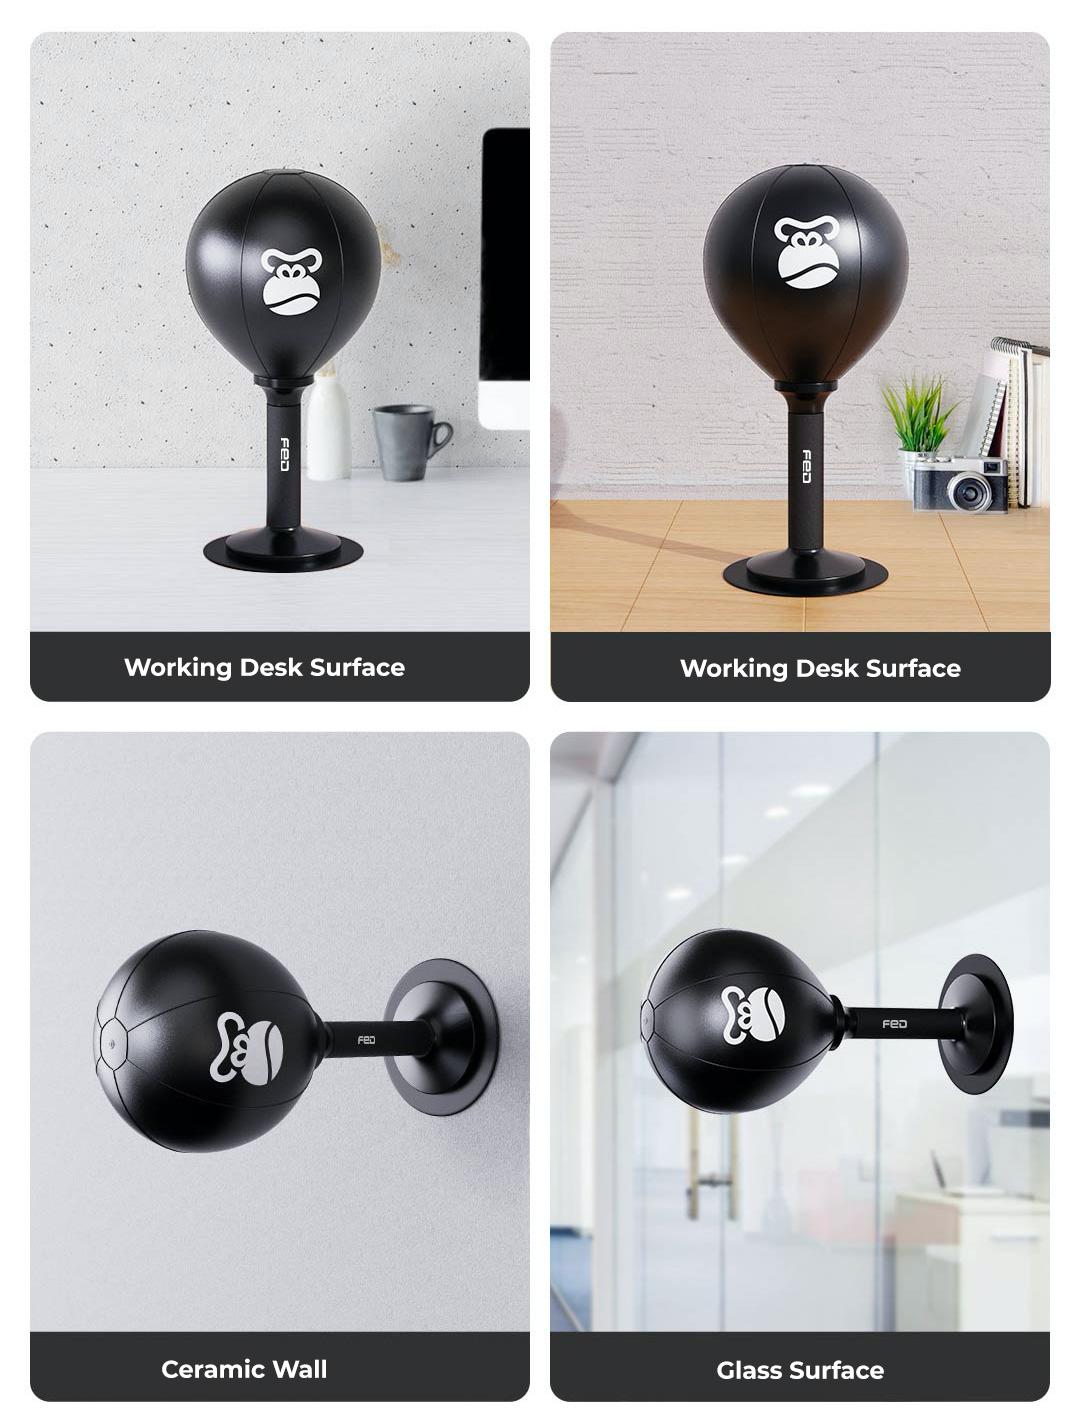 Xiaomi FED Stress Relief Desktop Punching Ball